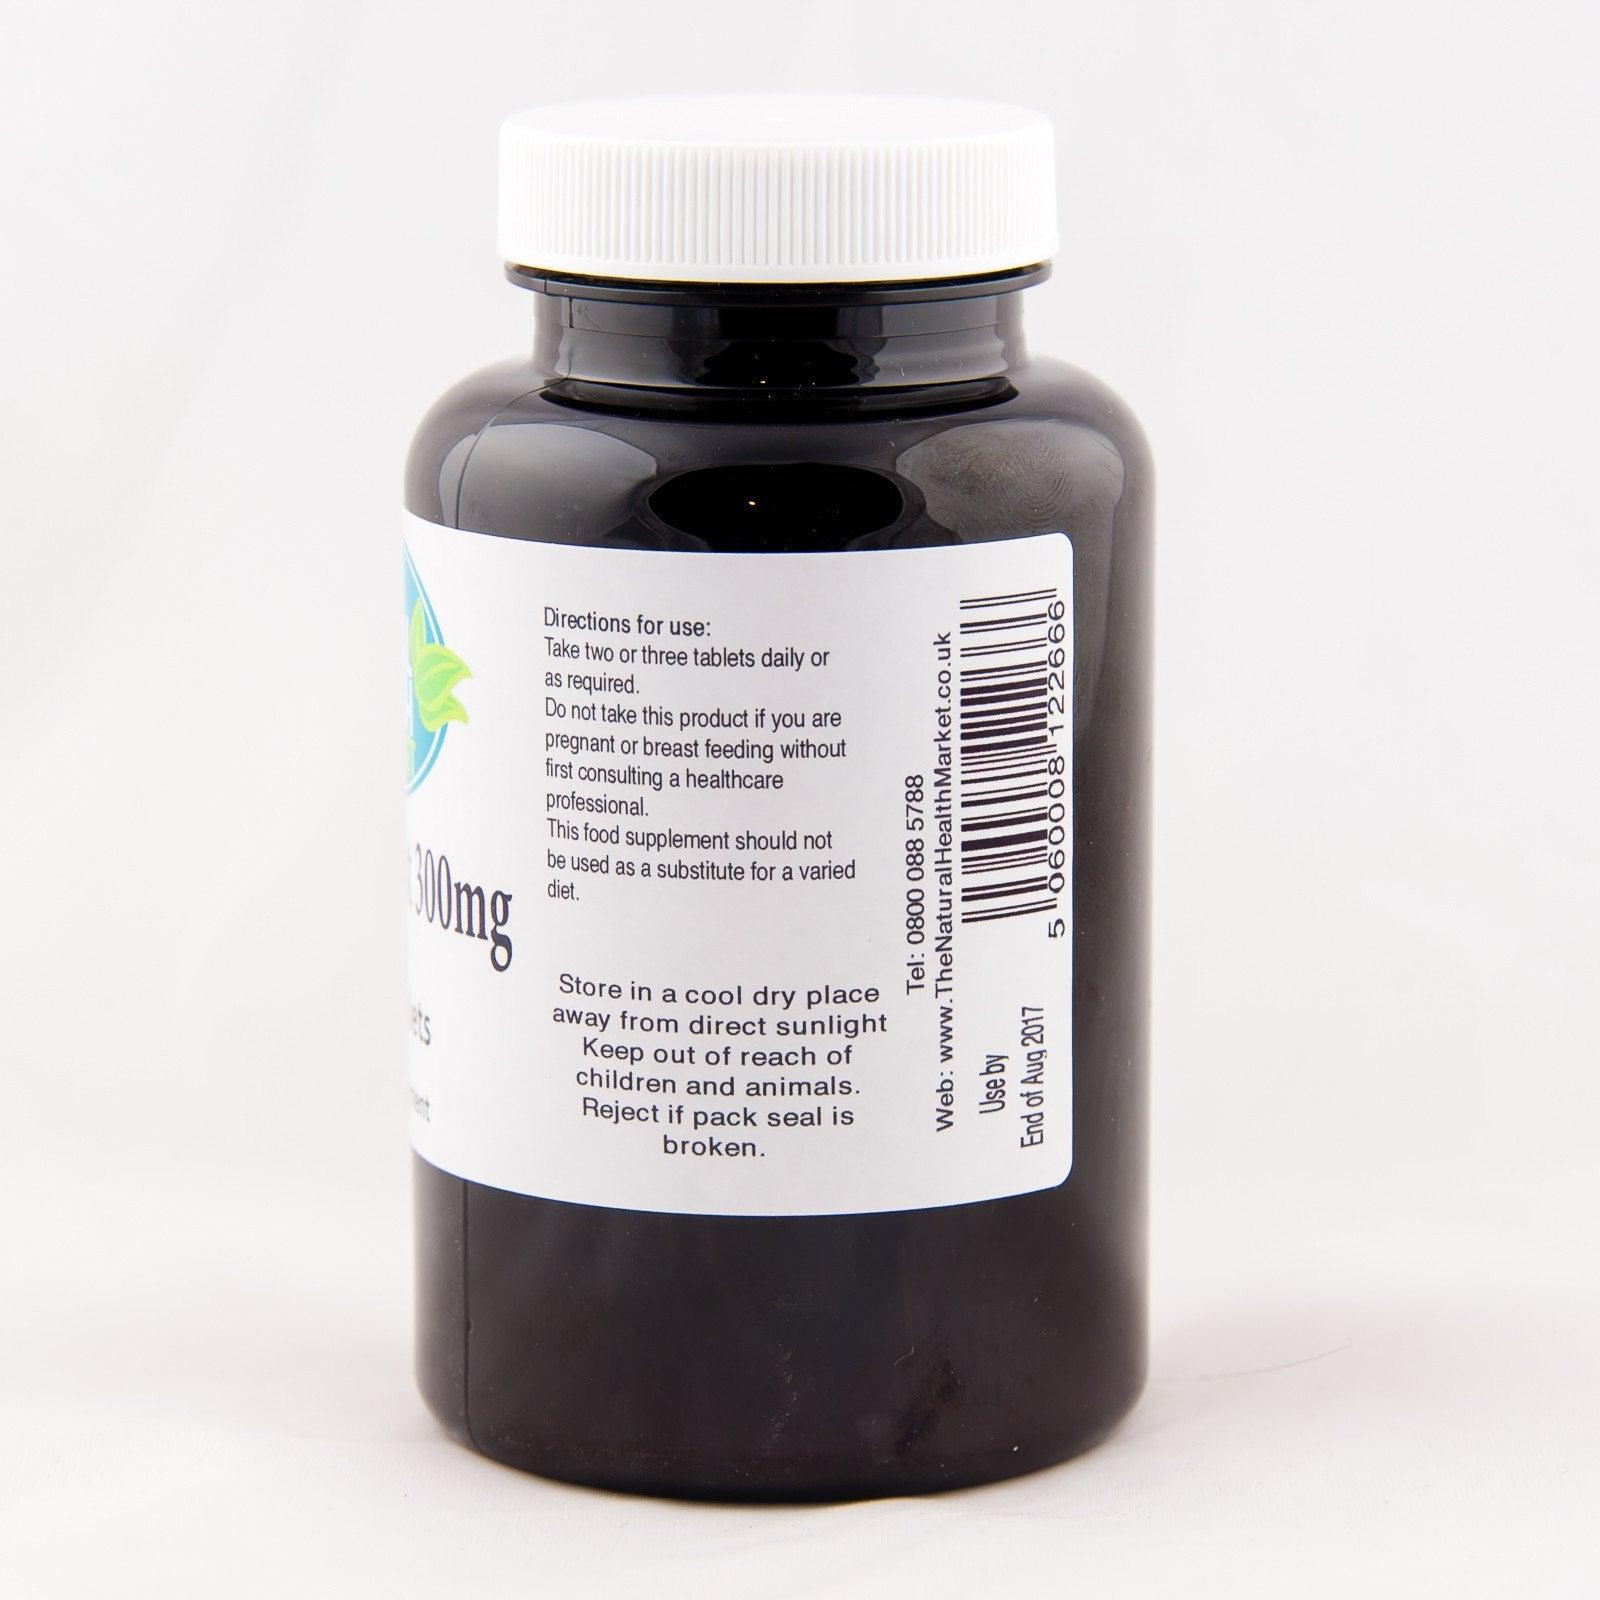 herbal clean premium detox instructions